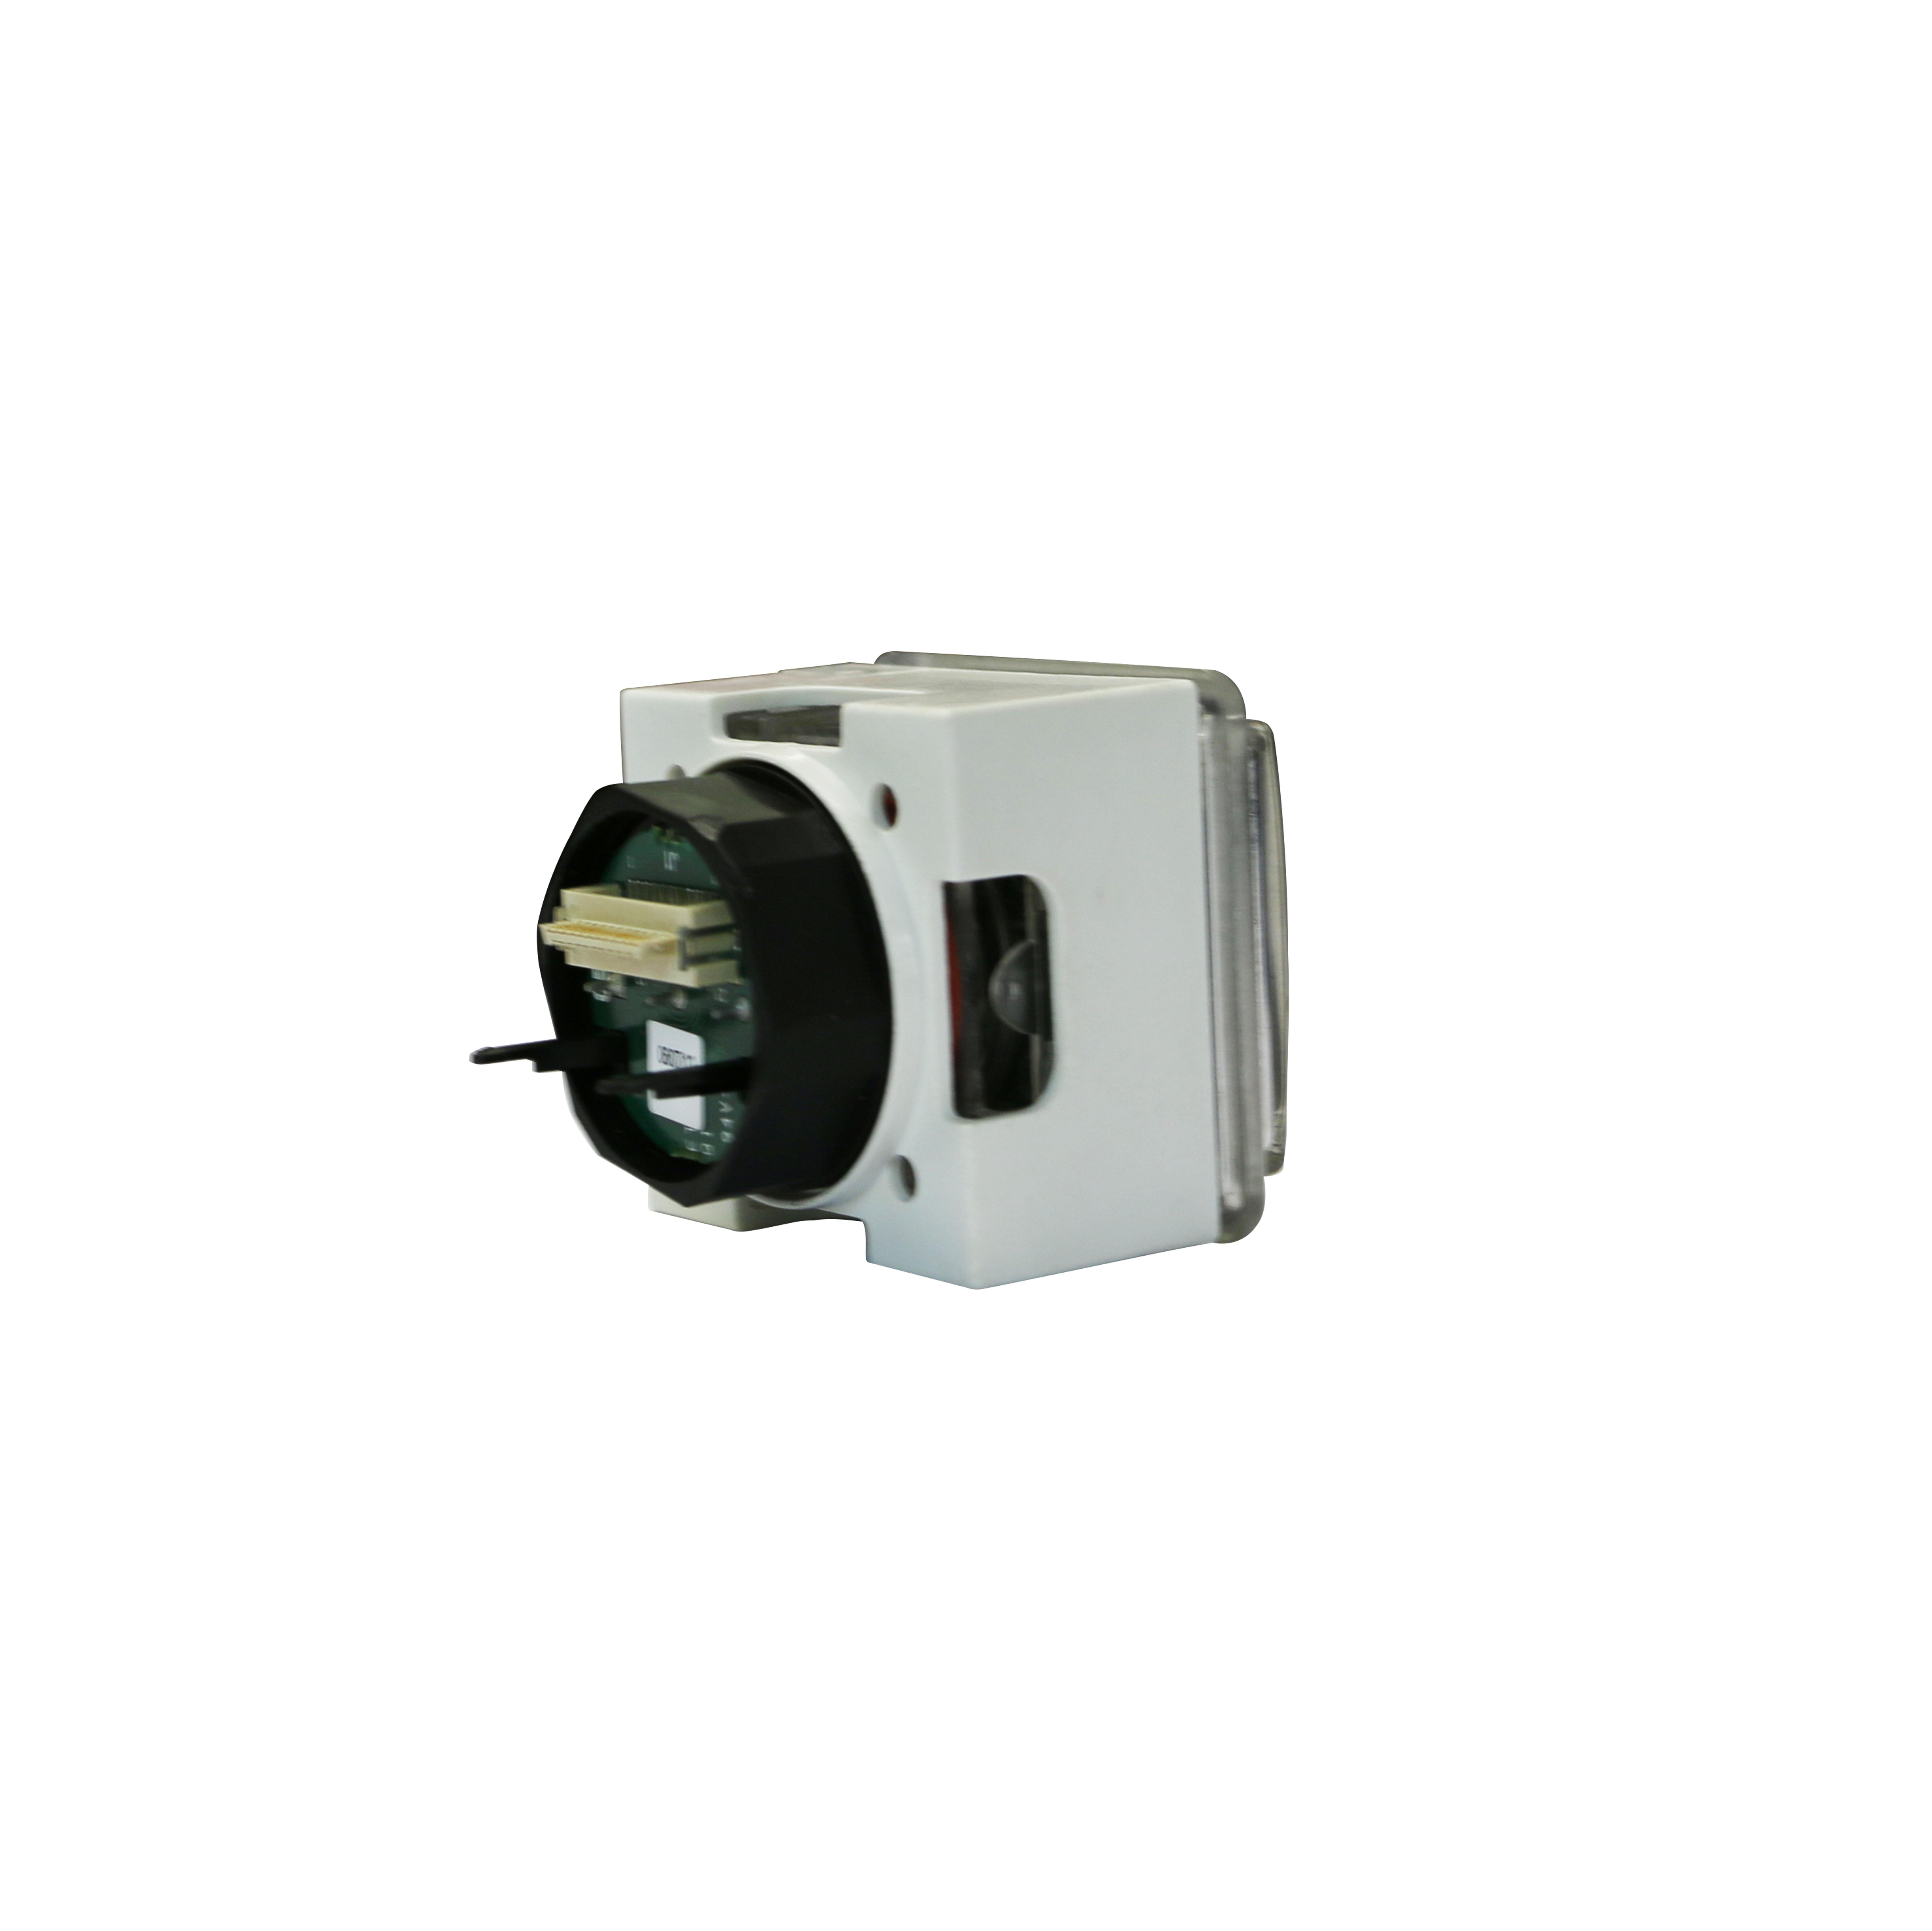 Igt Dynamic Button 1 4 X 1 35 51841900 Crpx